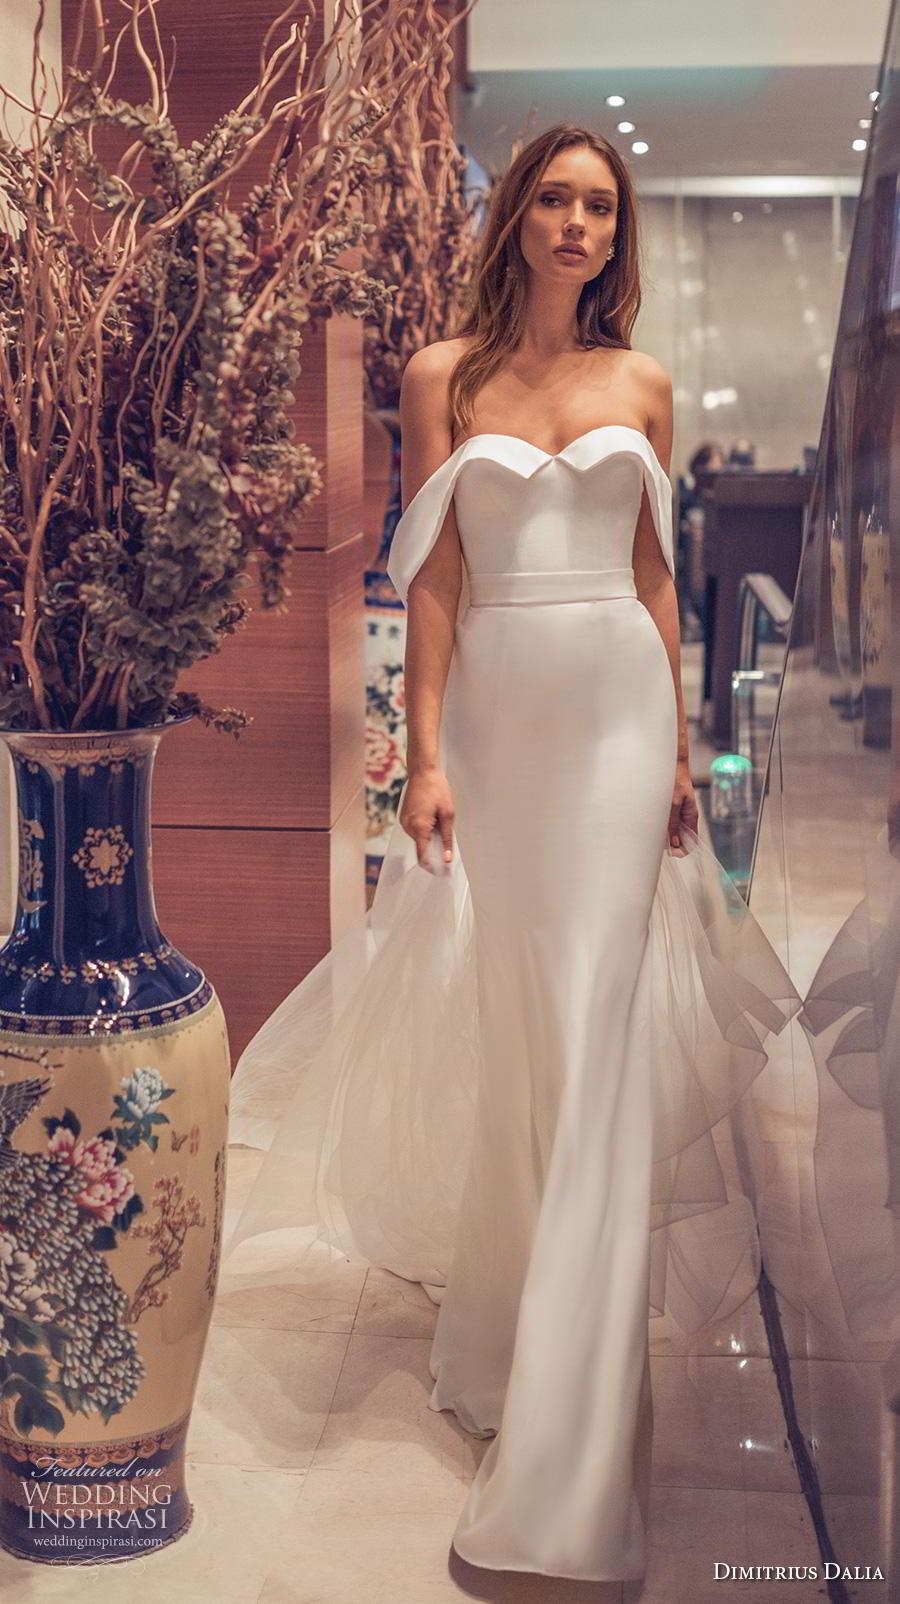 dimitrius dalia 2019 bridal off the shoulder sweetheart neckline simple minimalist elegant sheath wedding dress chapel train (15) mv